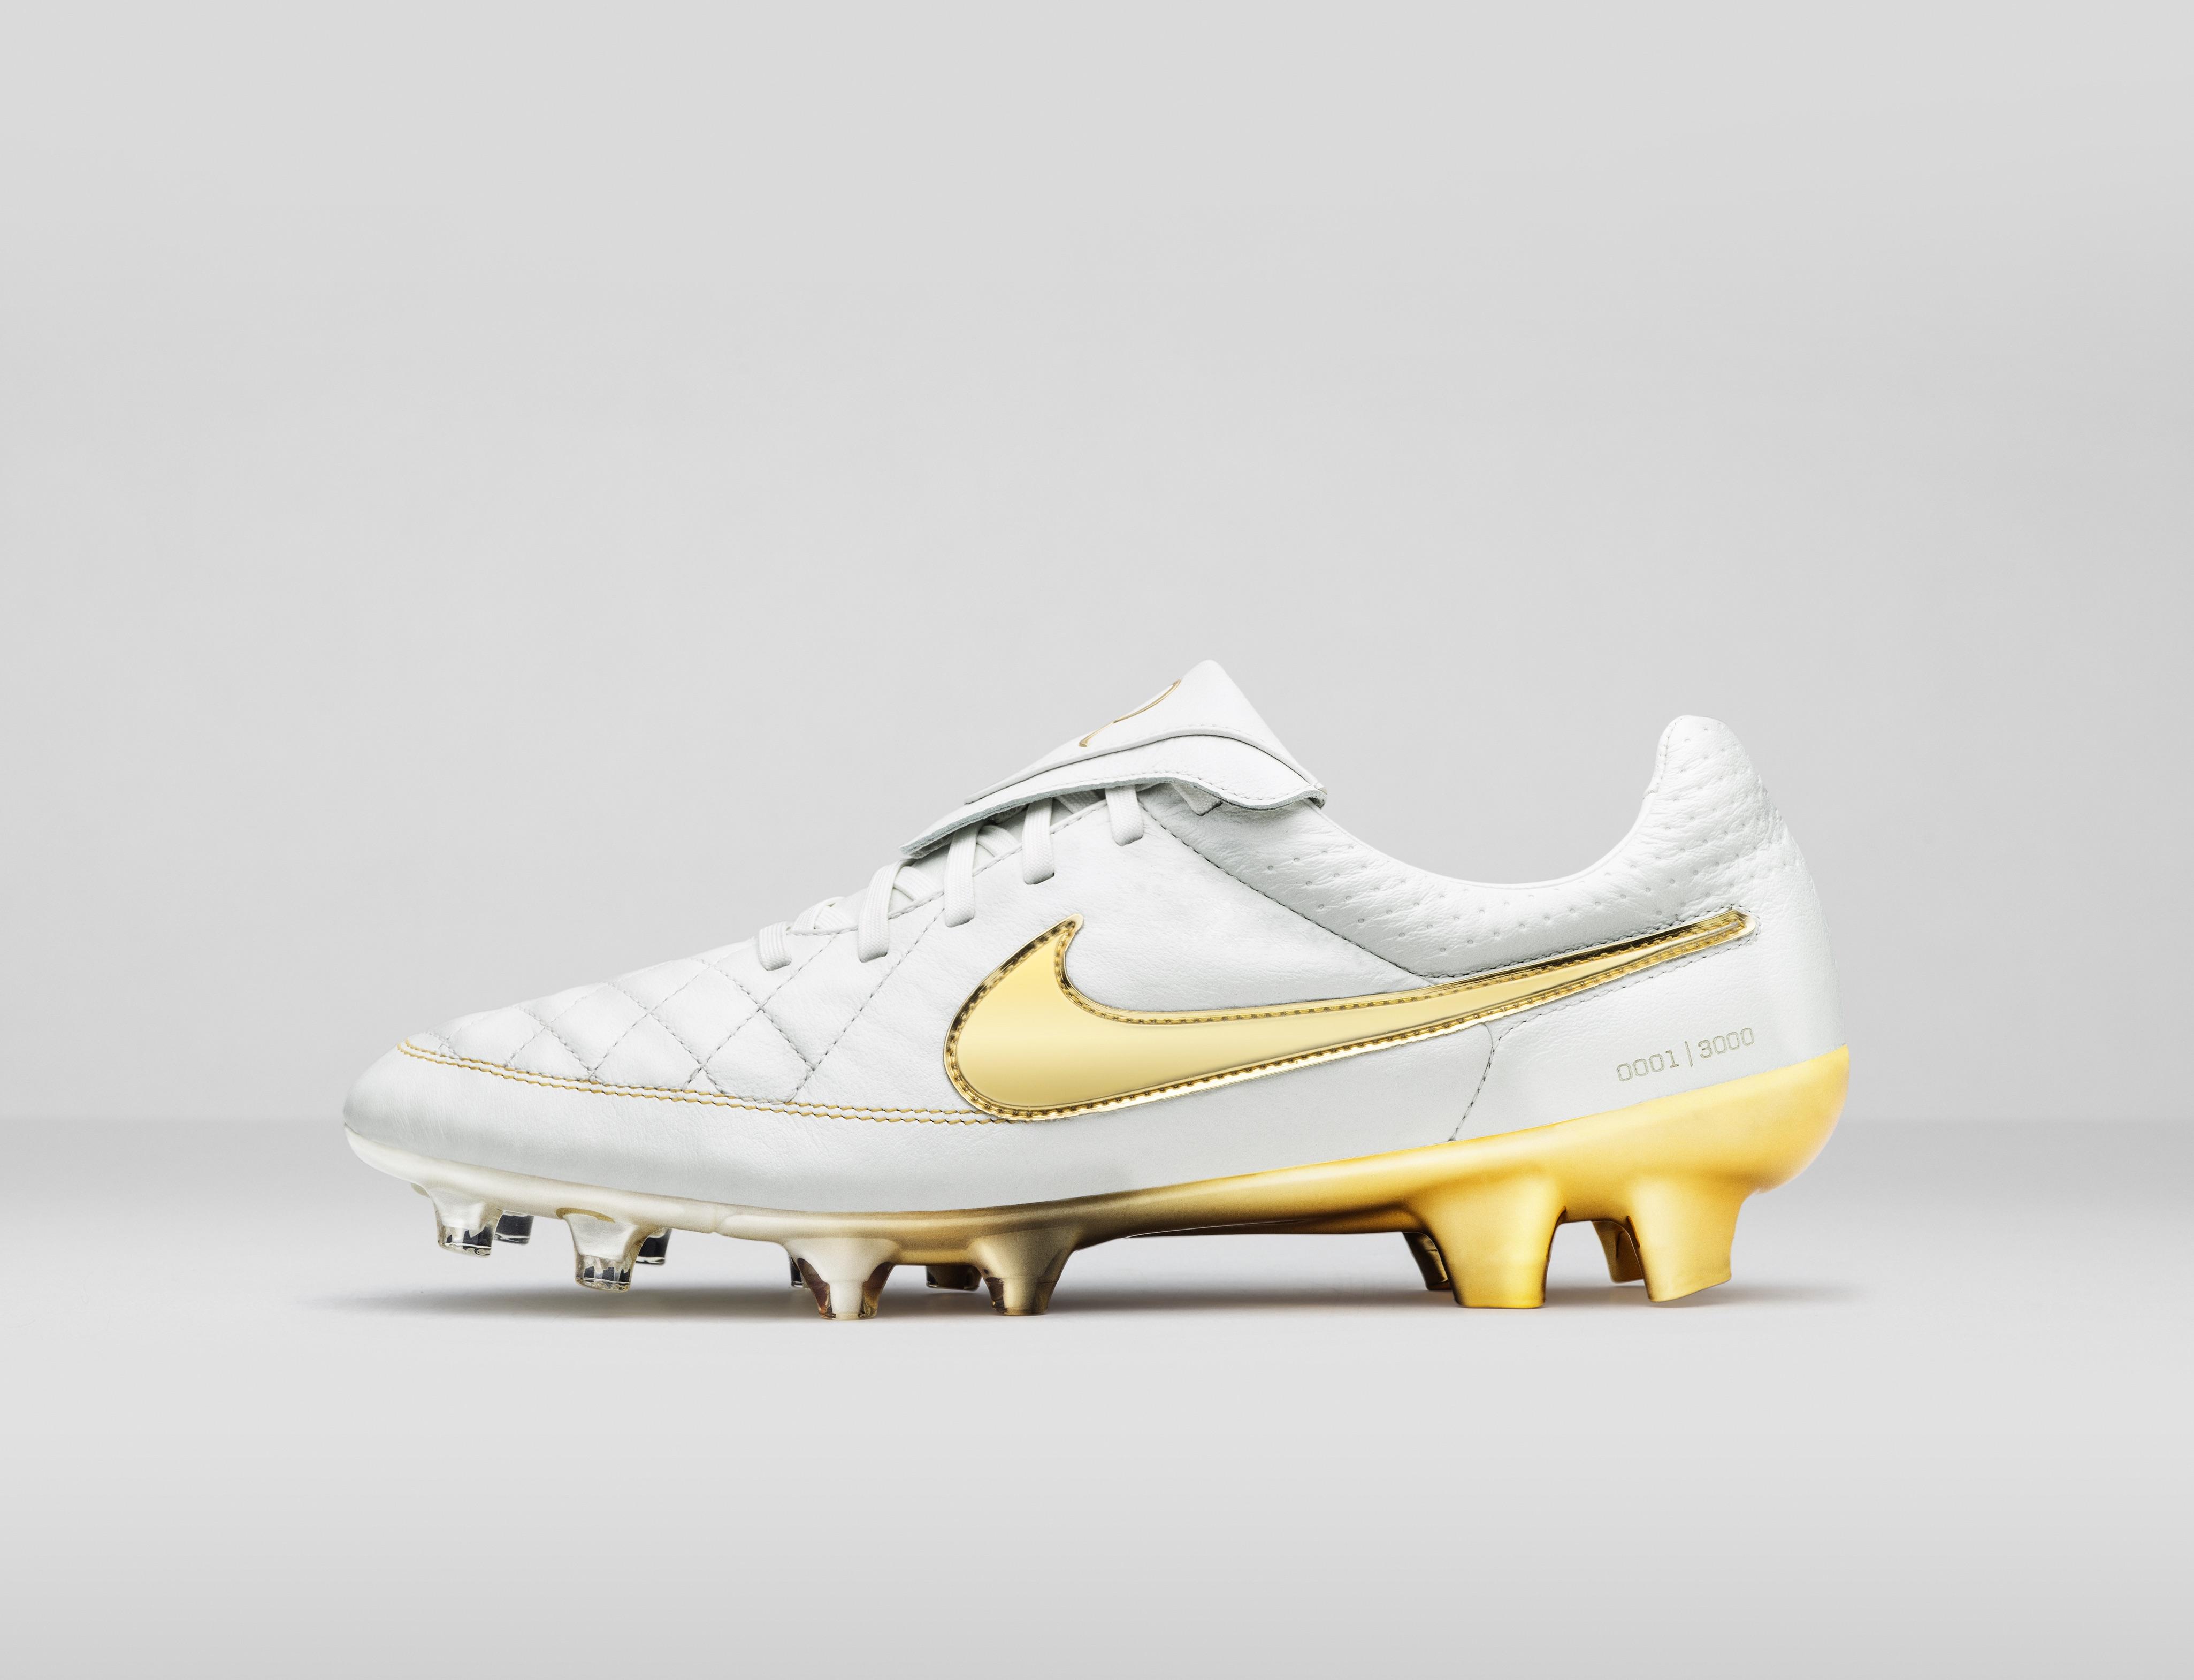 tiempo football Nike football Nike det 09 tiempo r pair Nike 44681 football gold ronaldino 44690 out gold gold tiempo ronaldino ronaldino 44683 pair aUdZwU